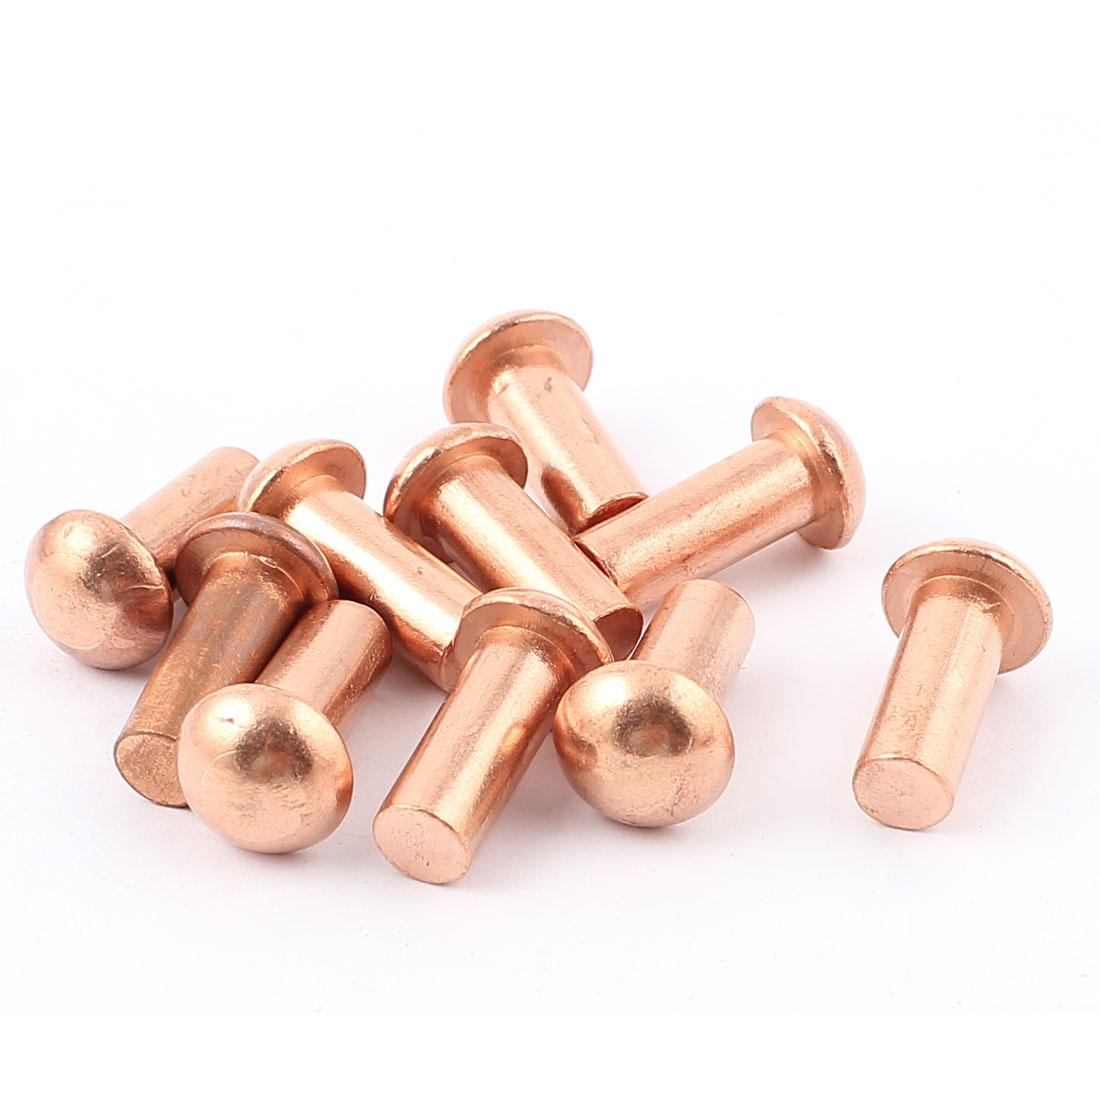 "10 Pcs 5/16"" Dia. 25/32"" L Shank Copper Round Head Solid Rivets Fasteners"